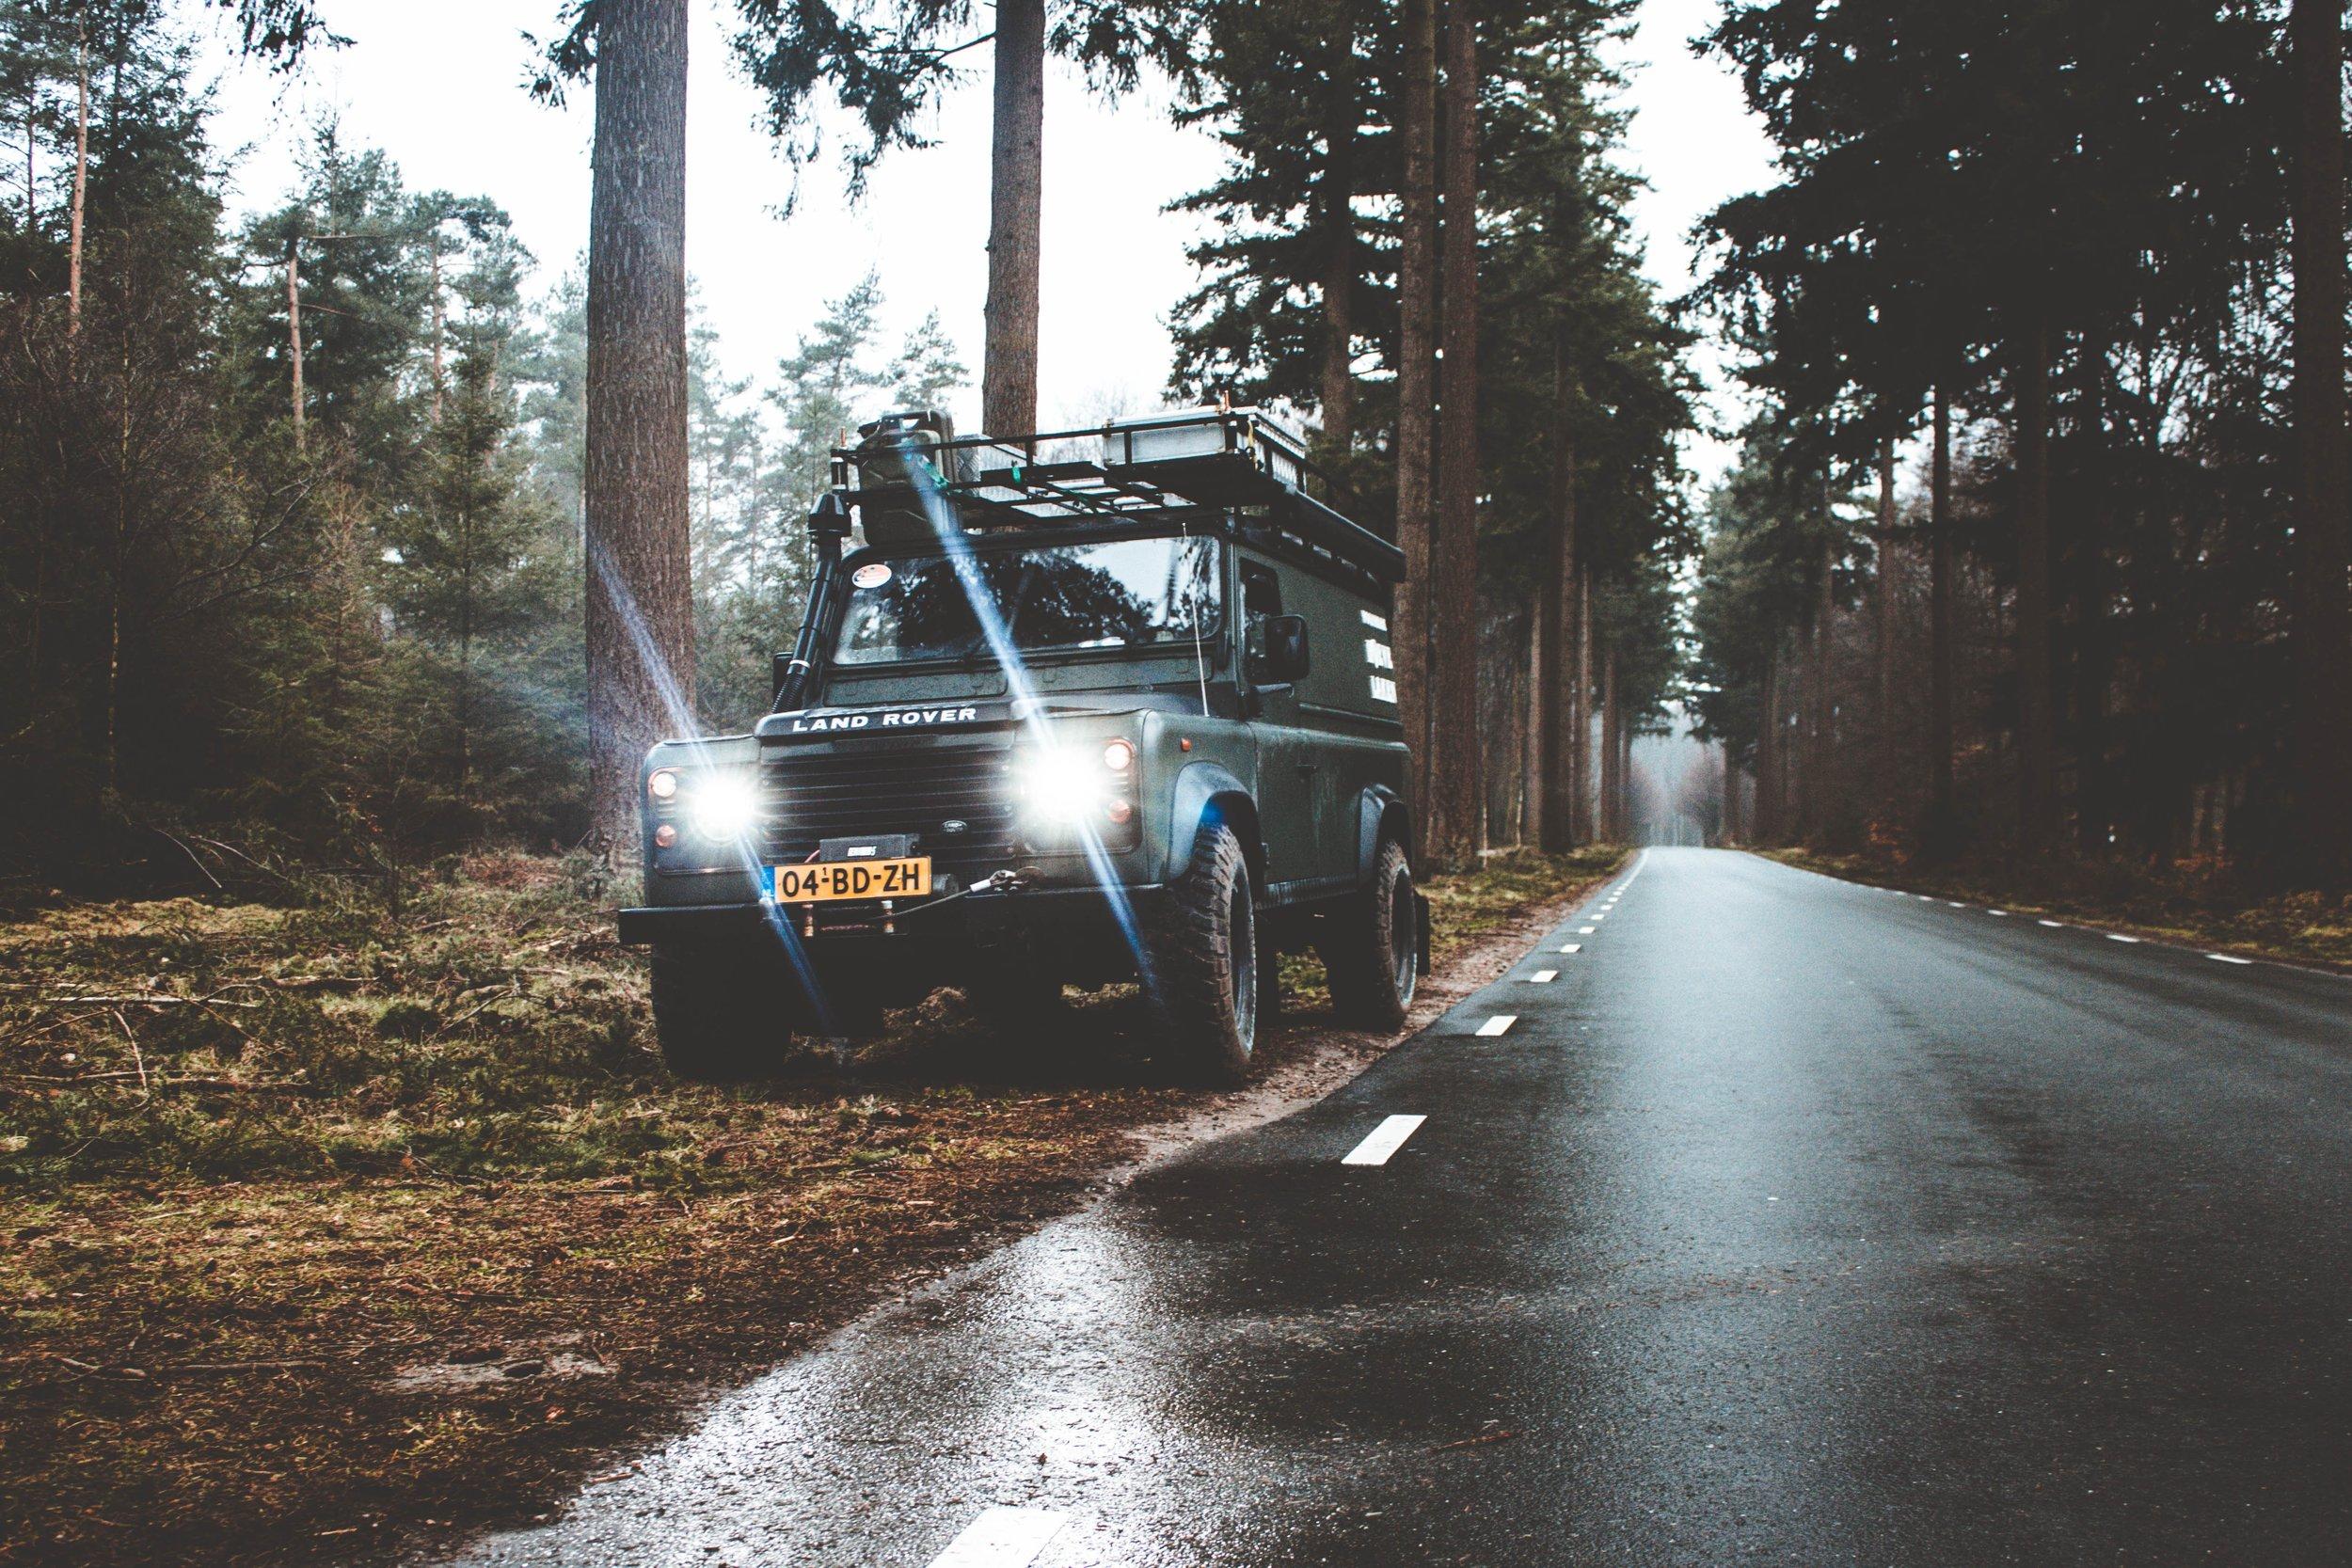 Jaguar Land Rover - eCAR: Putting Jaguar Land Rover's supplier management into overdrive